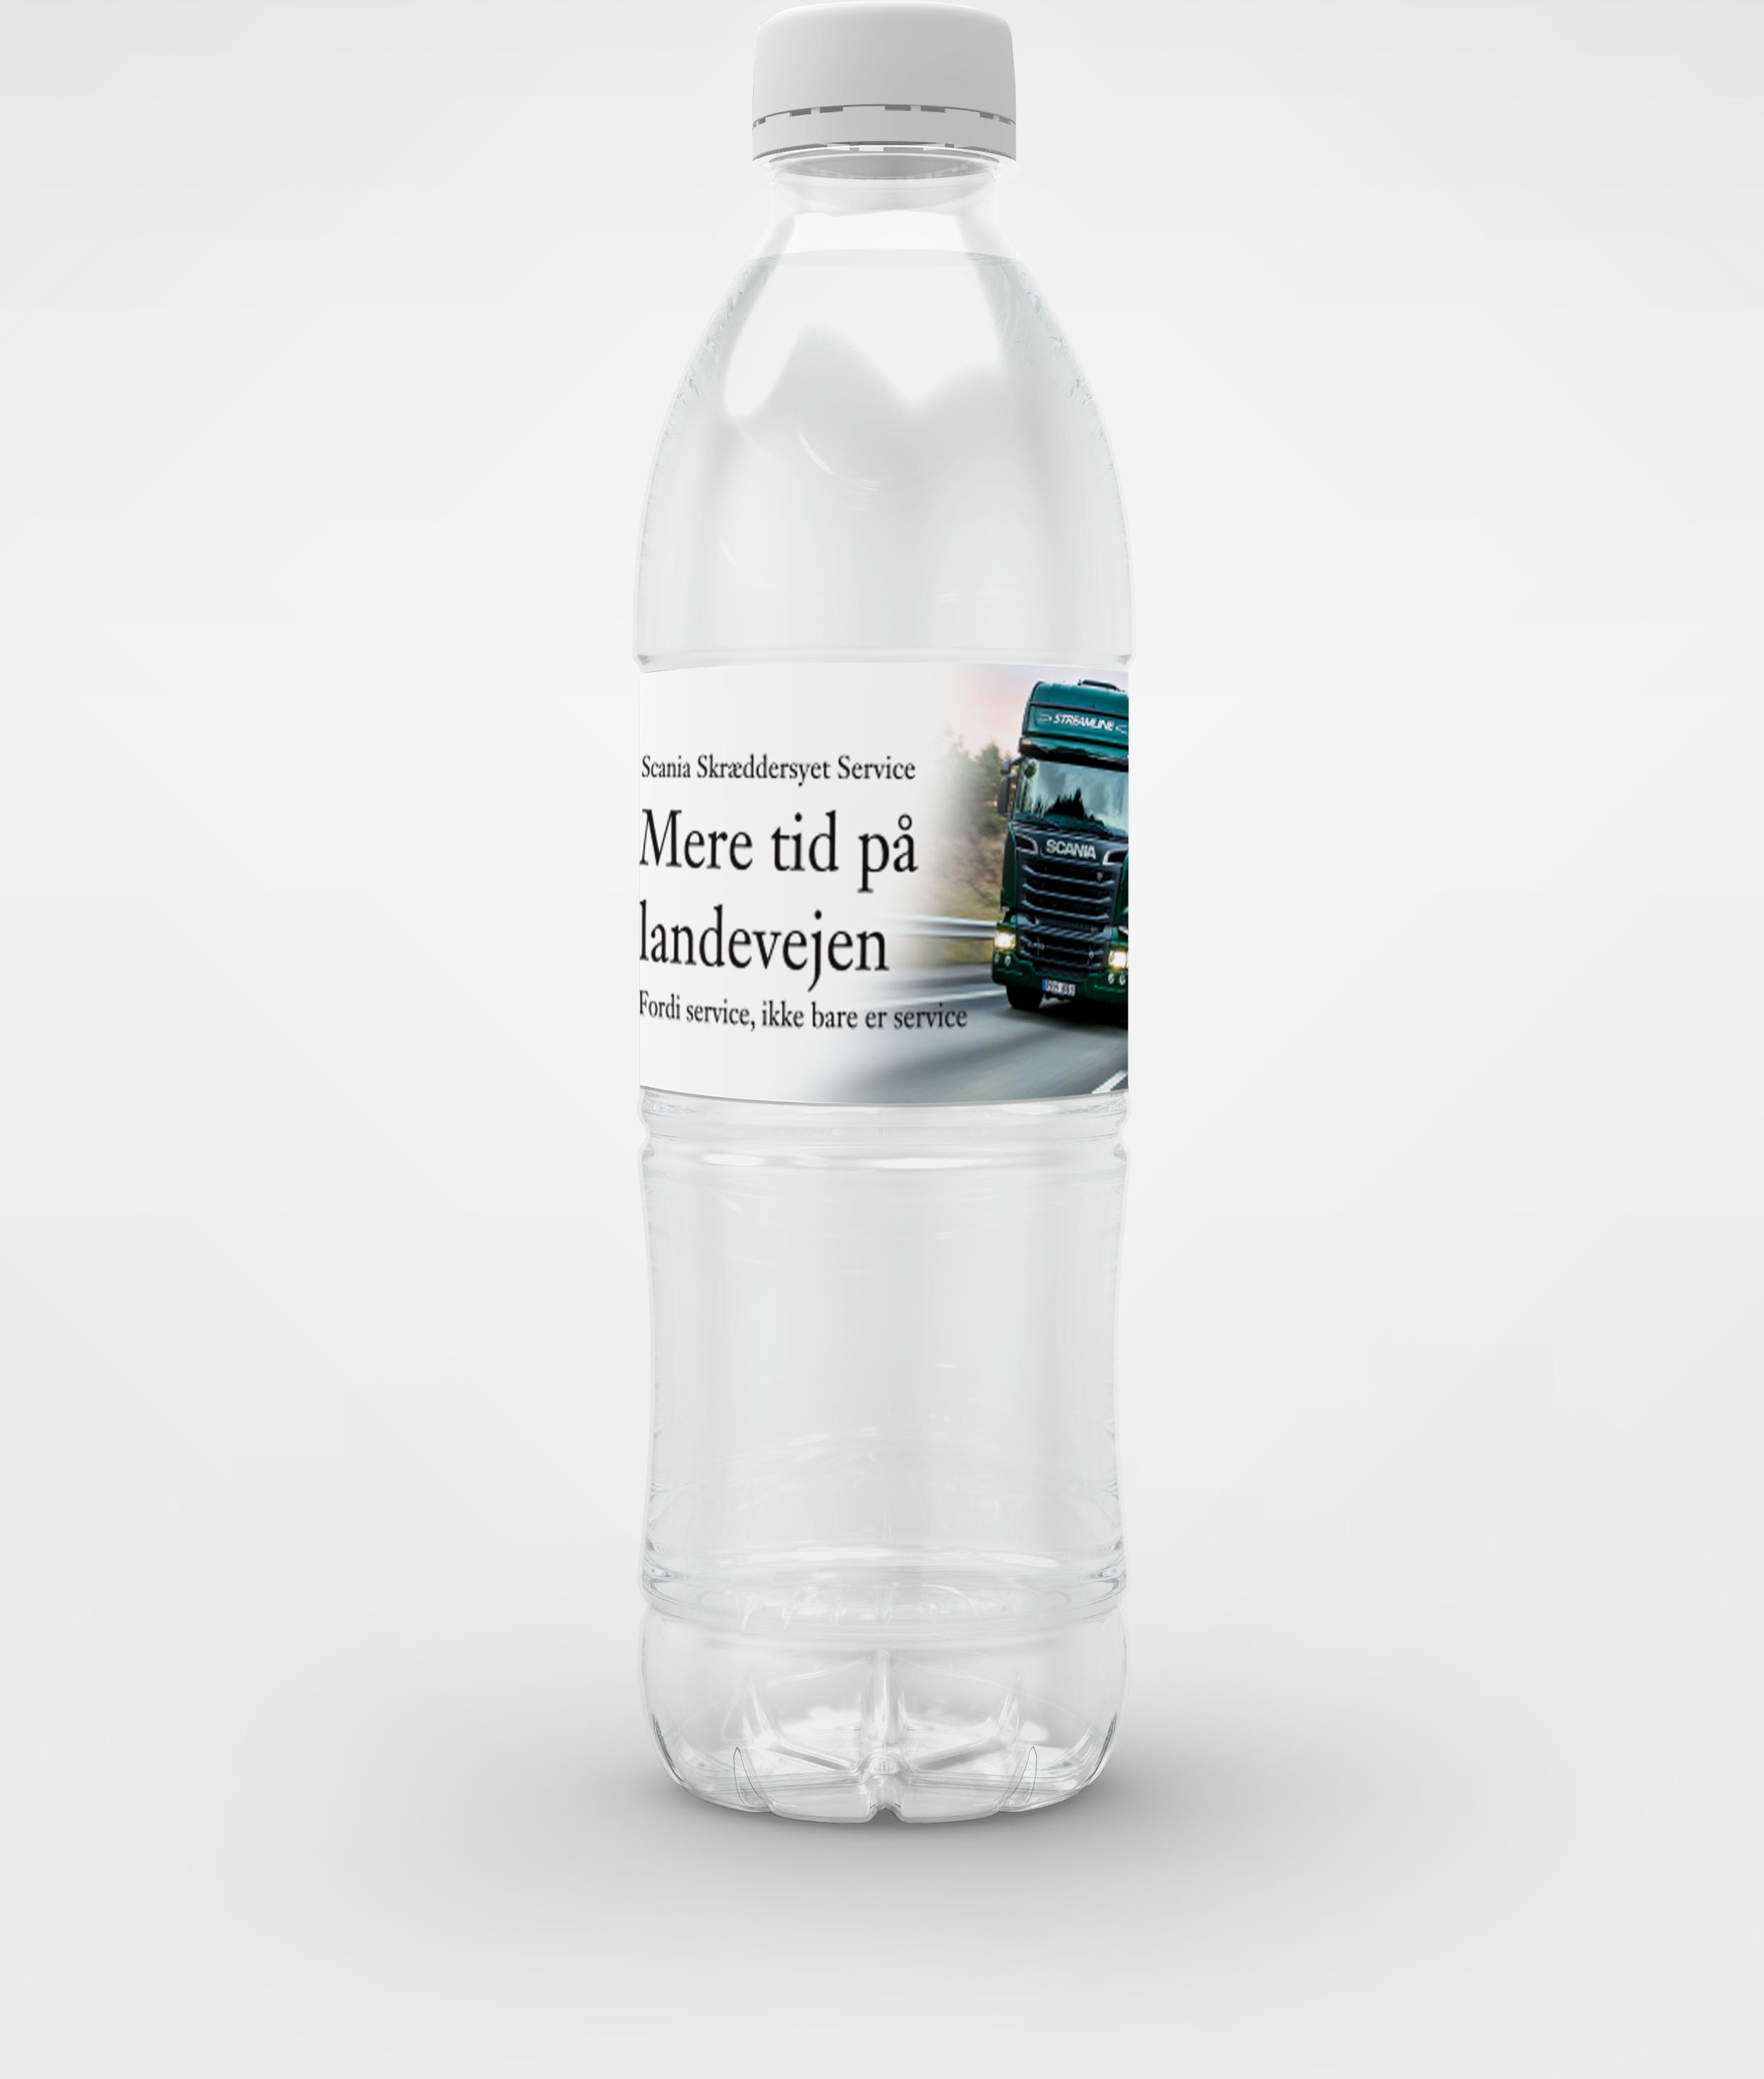 scania-vandflaske.png